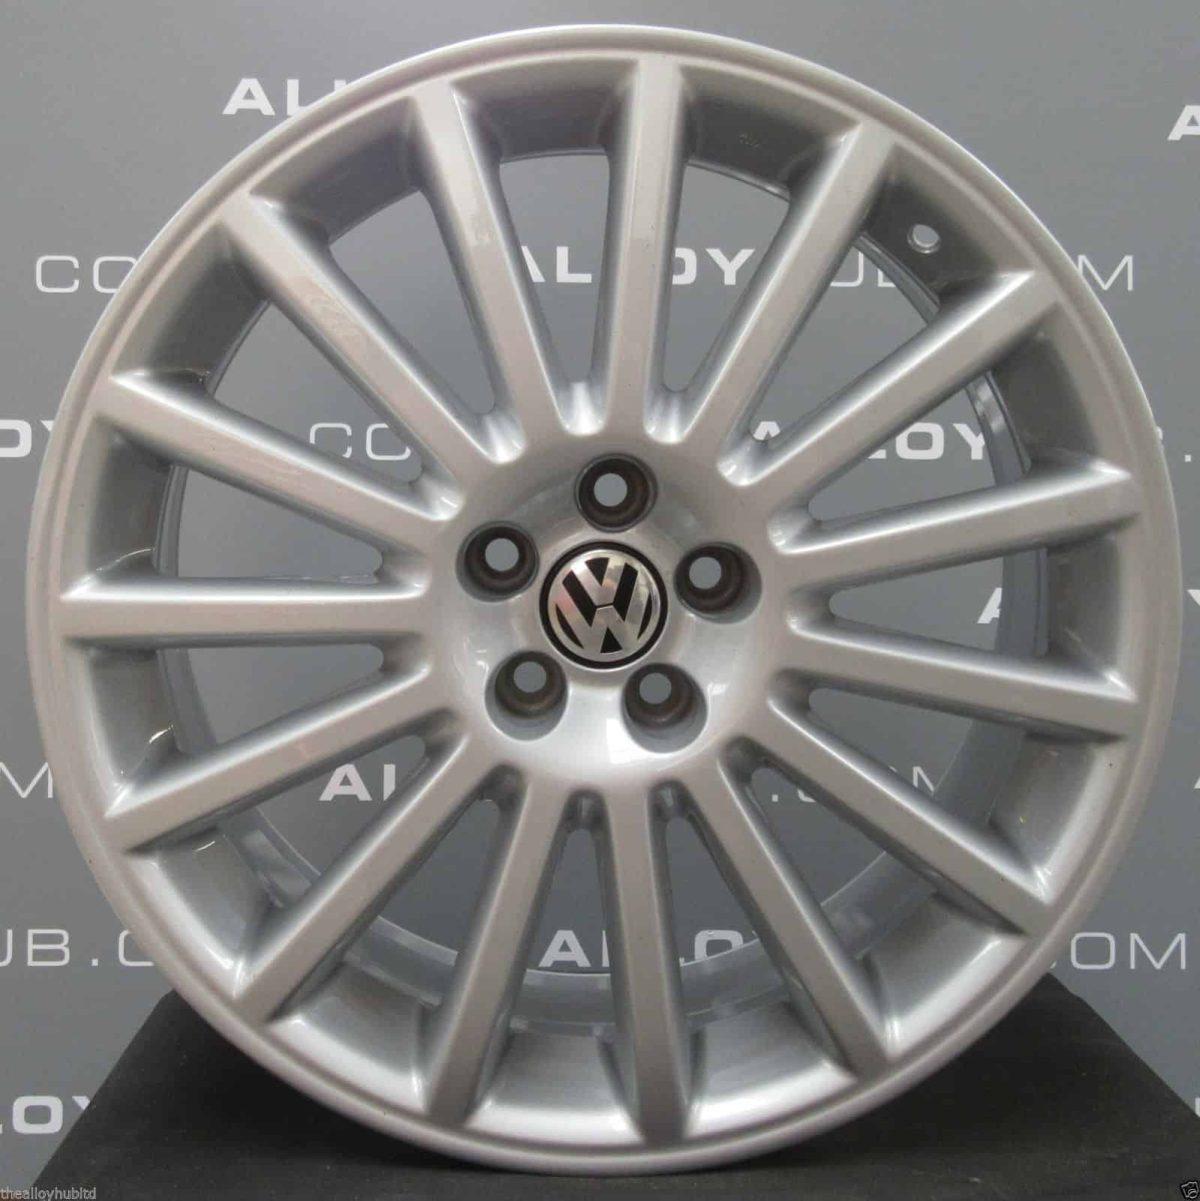 Genuine Volkswagen Golf MK4 R32 15 Spoke 18″ inch Alloy Wheels with Silver Finish 1J0 601 025 BA